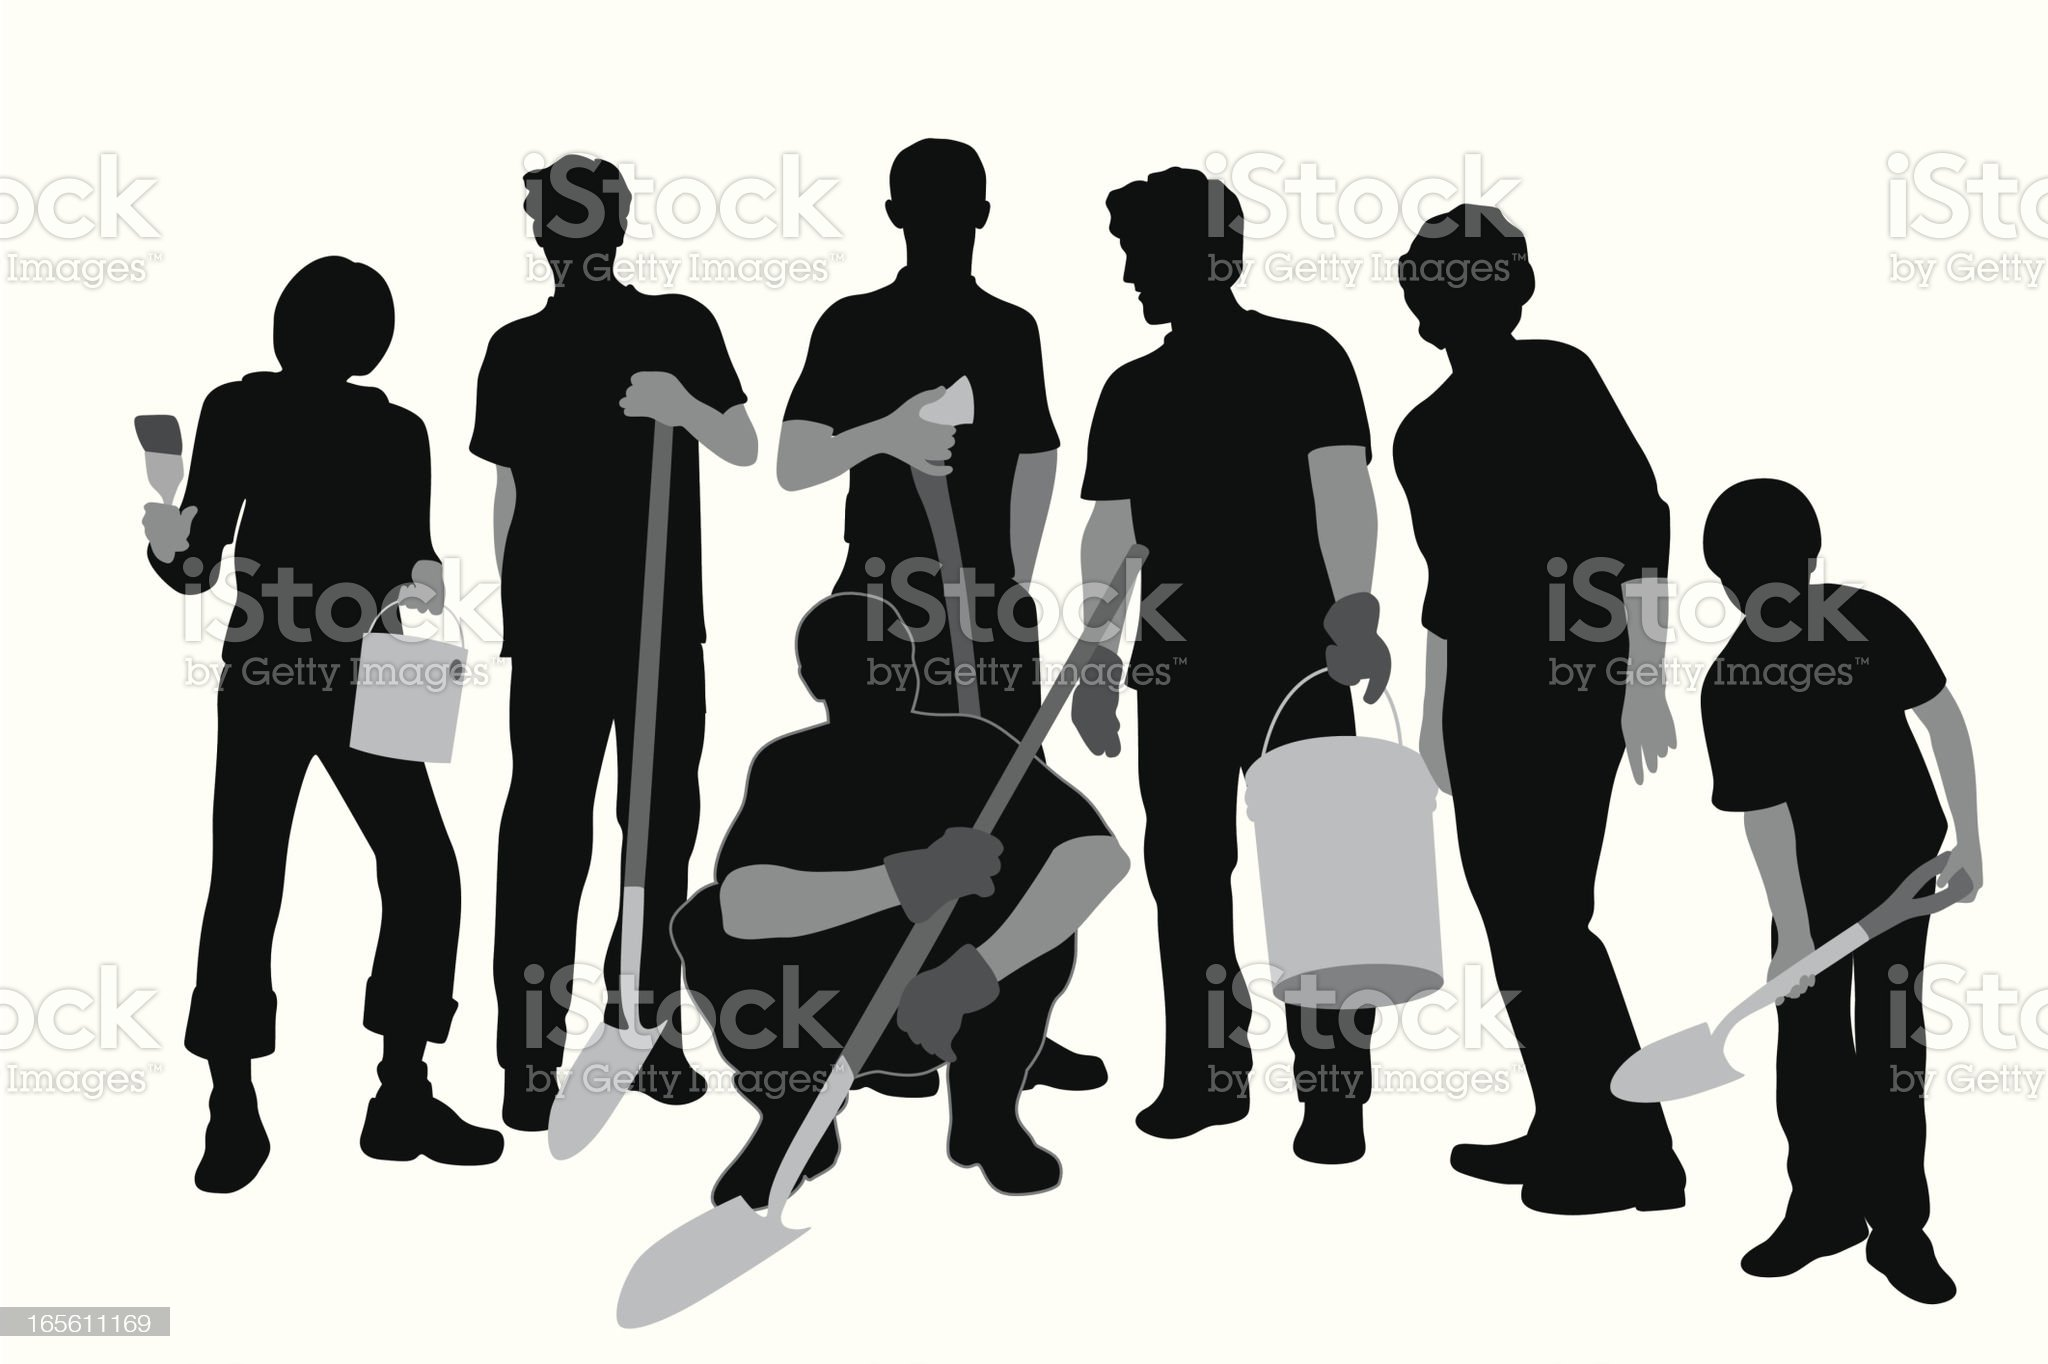 Community Work Vector Silhouette royalty-free stock vector art